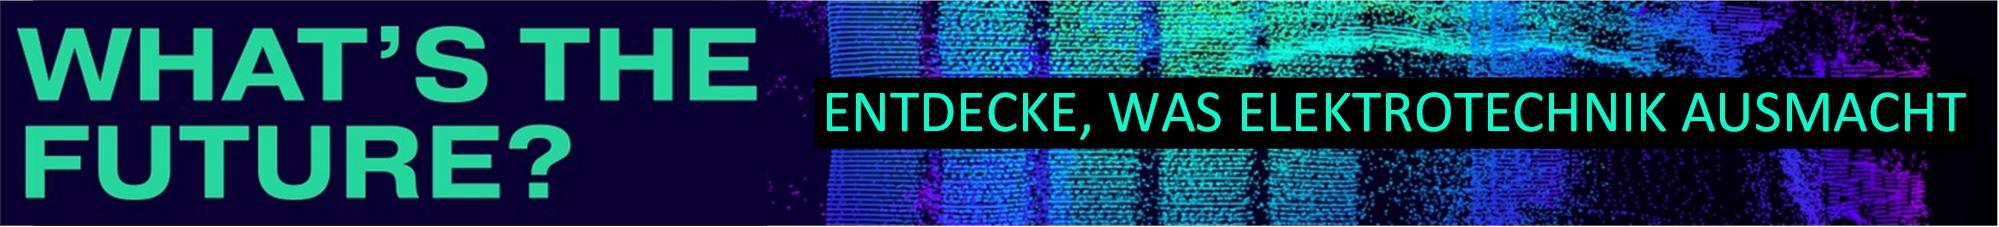 What's the future? Entdecke, was Elektrotechnik ausmacht.